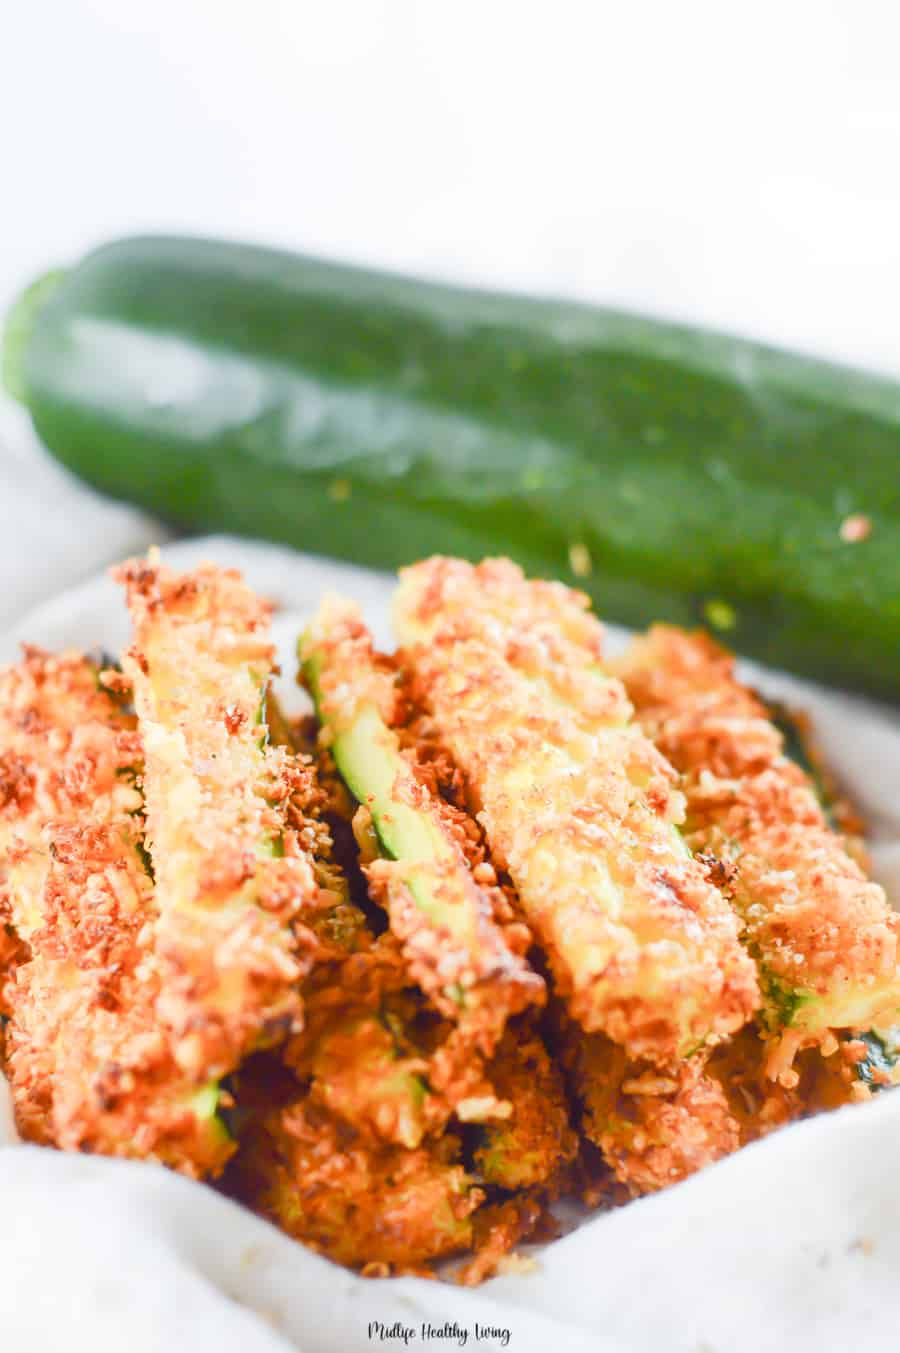 Ww Zucchini Air Fryer Recipes